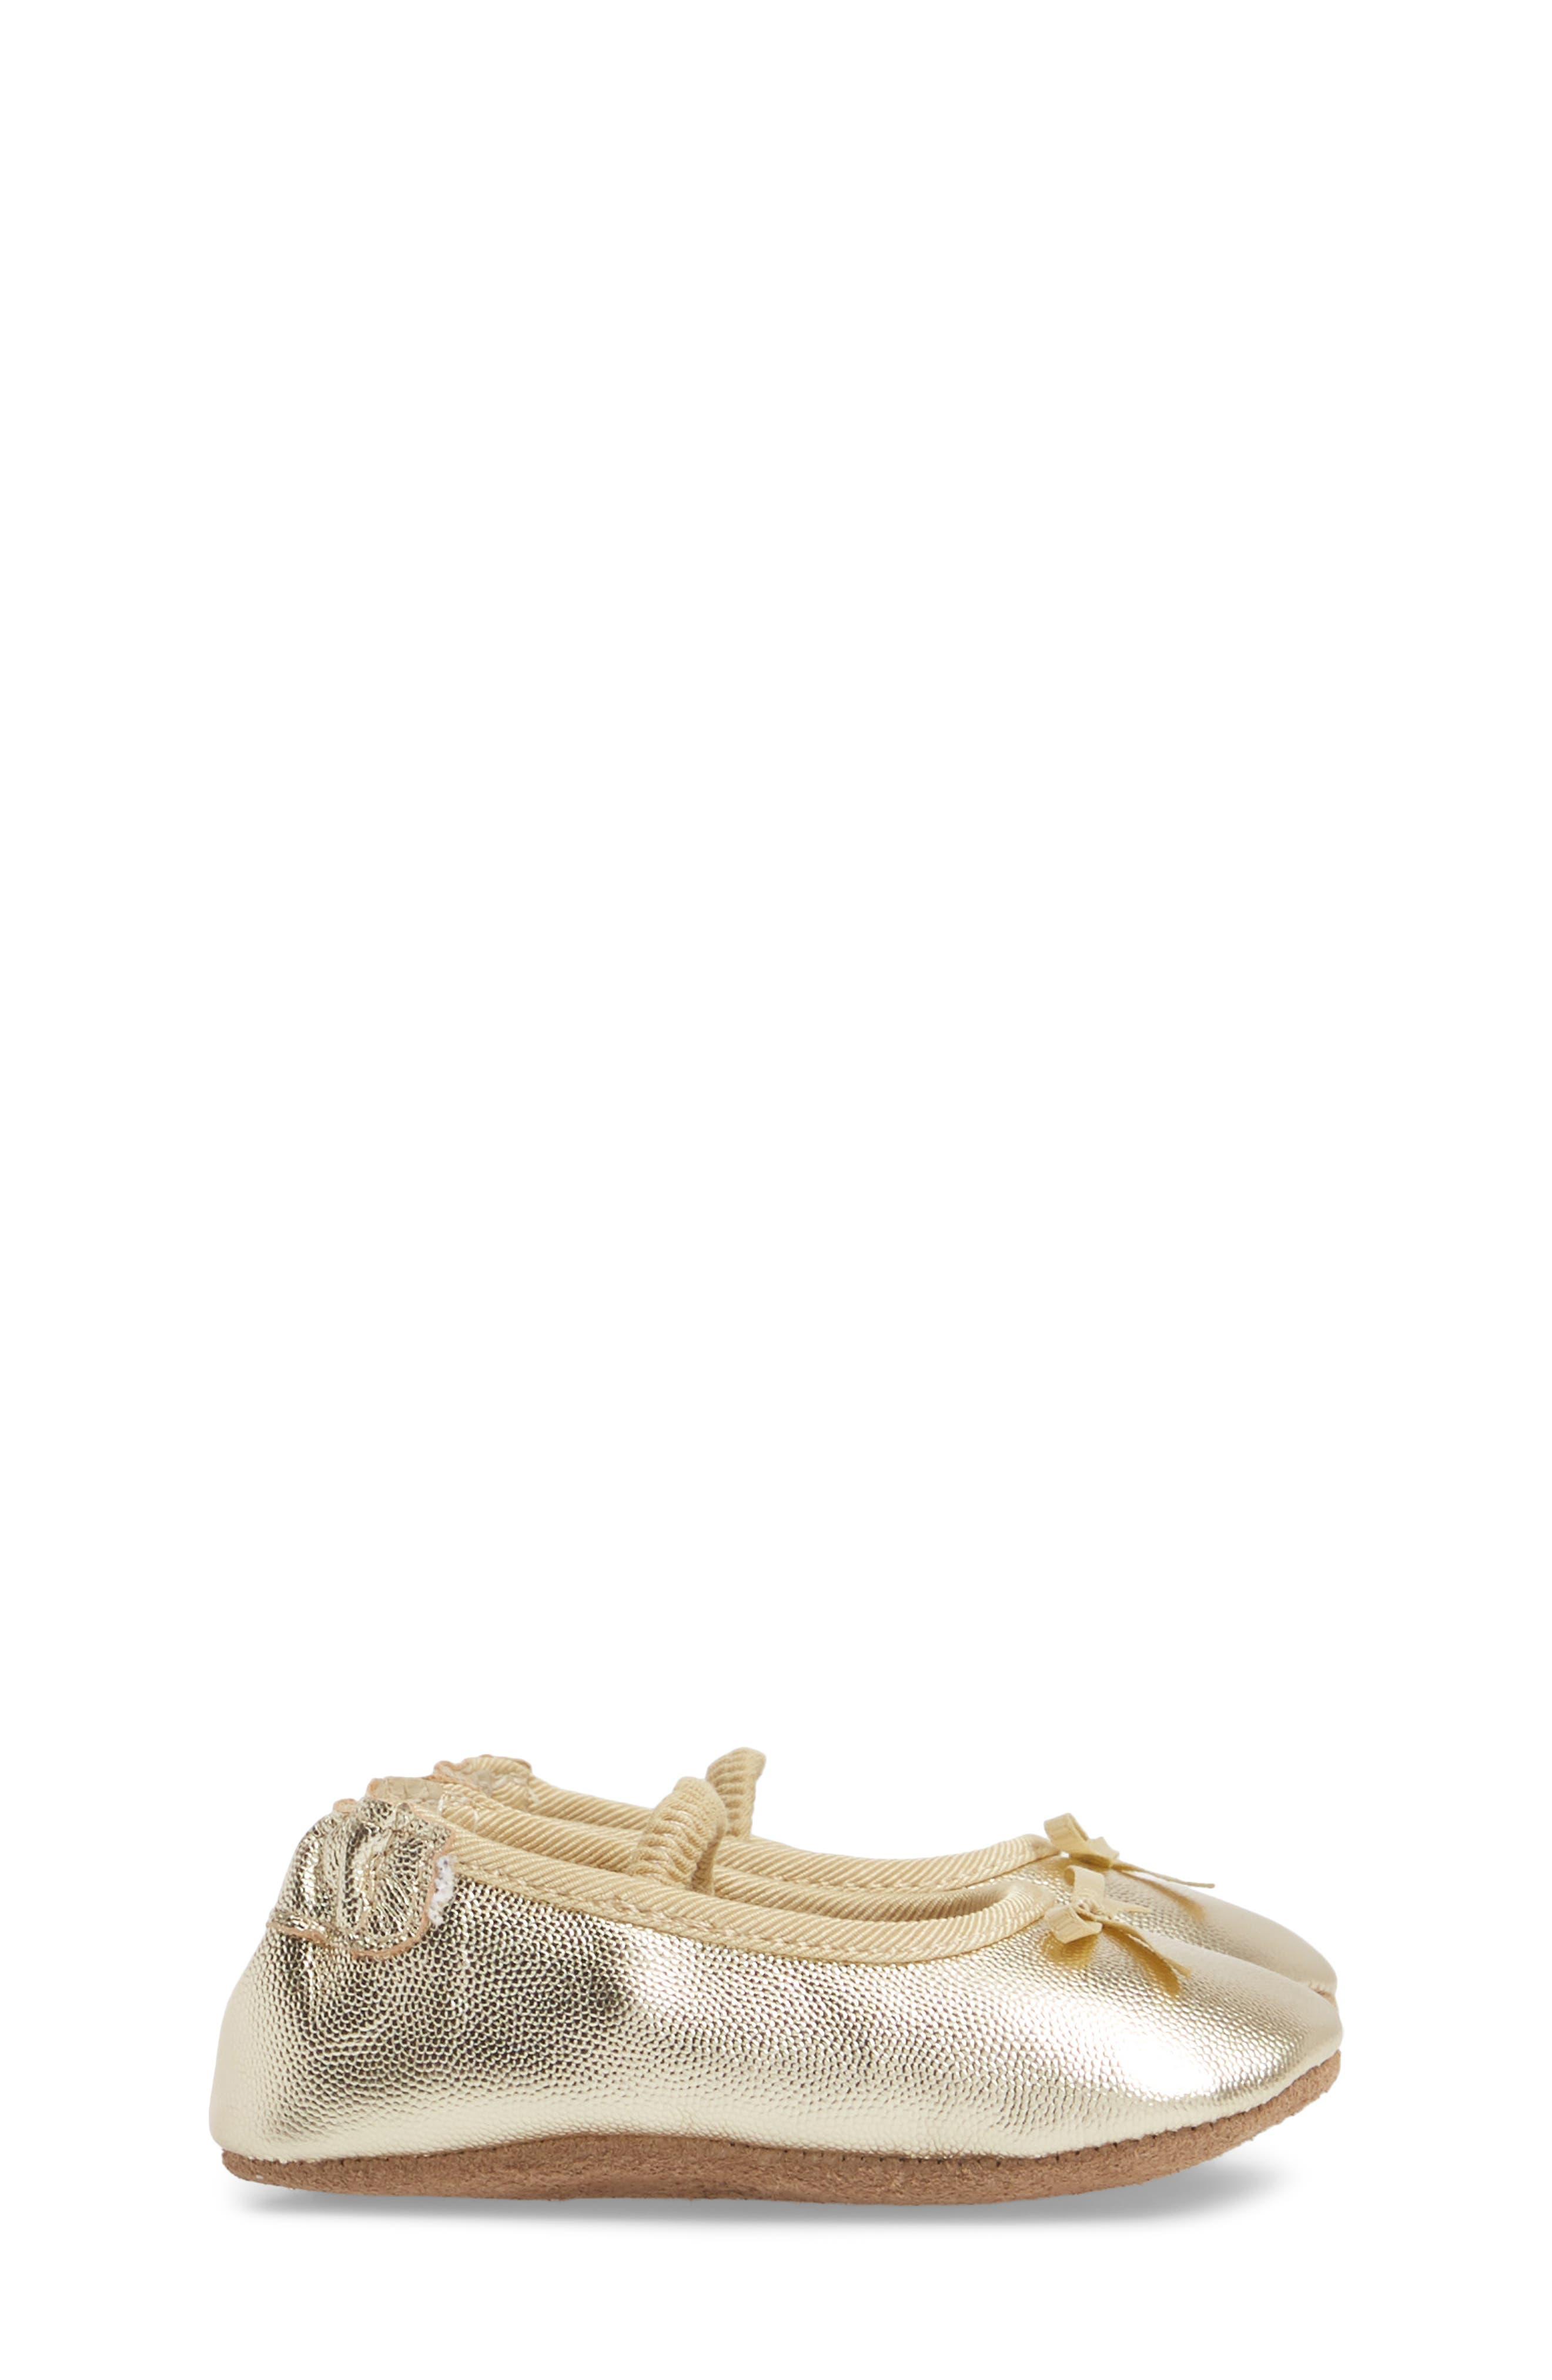 ROBEEZ<SUP>®</SUP>, Athena Ballet Strap Crib Shoe, Alternate thumbnail 3, color, GOLD